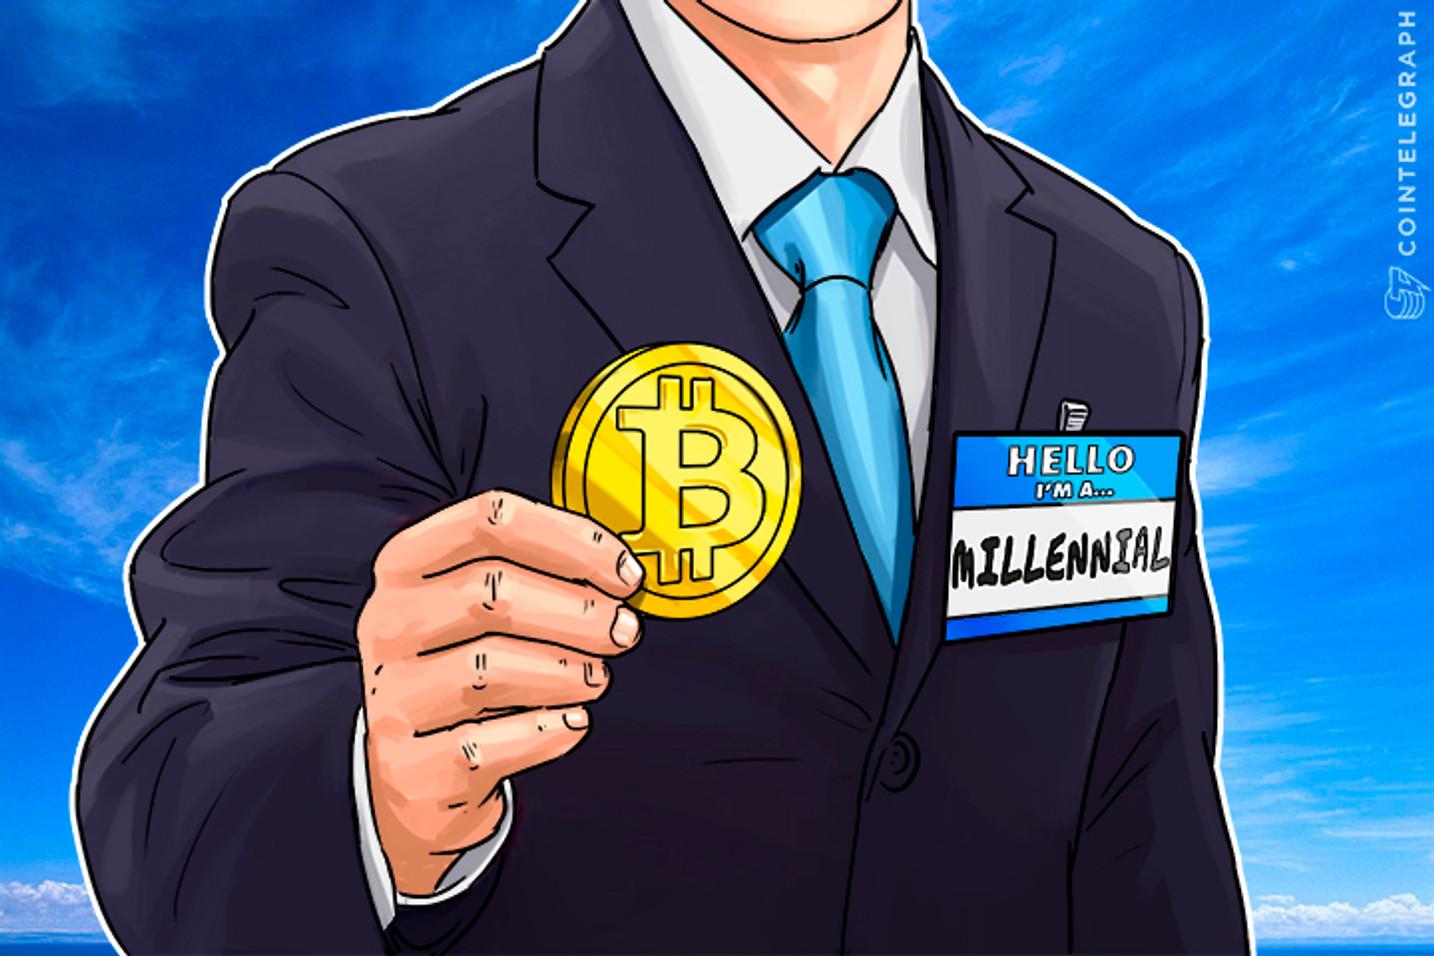 Two Billion New Bitcoin Users? 92 Percent of Millennials Don't Trust Banks